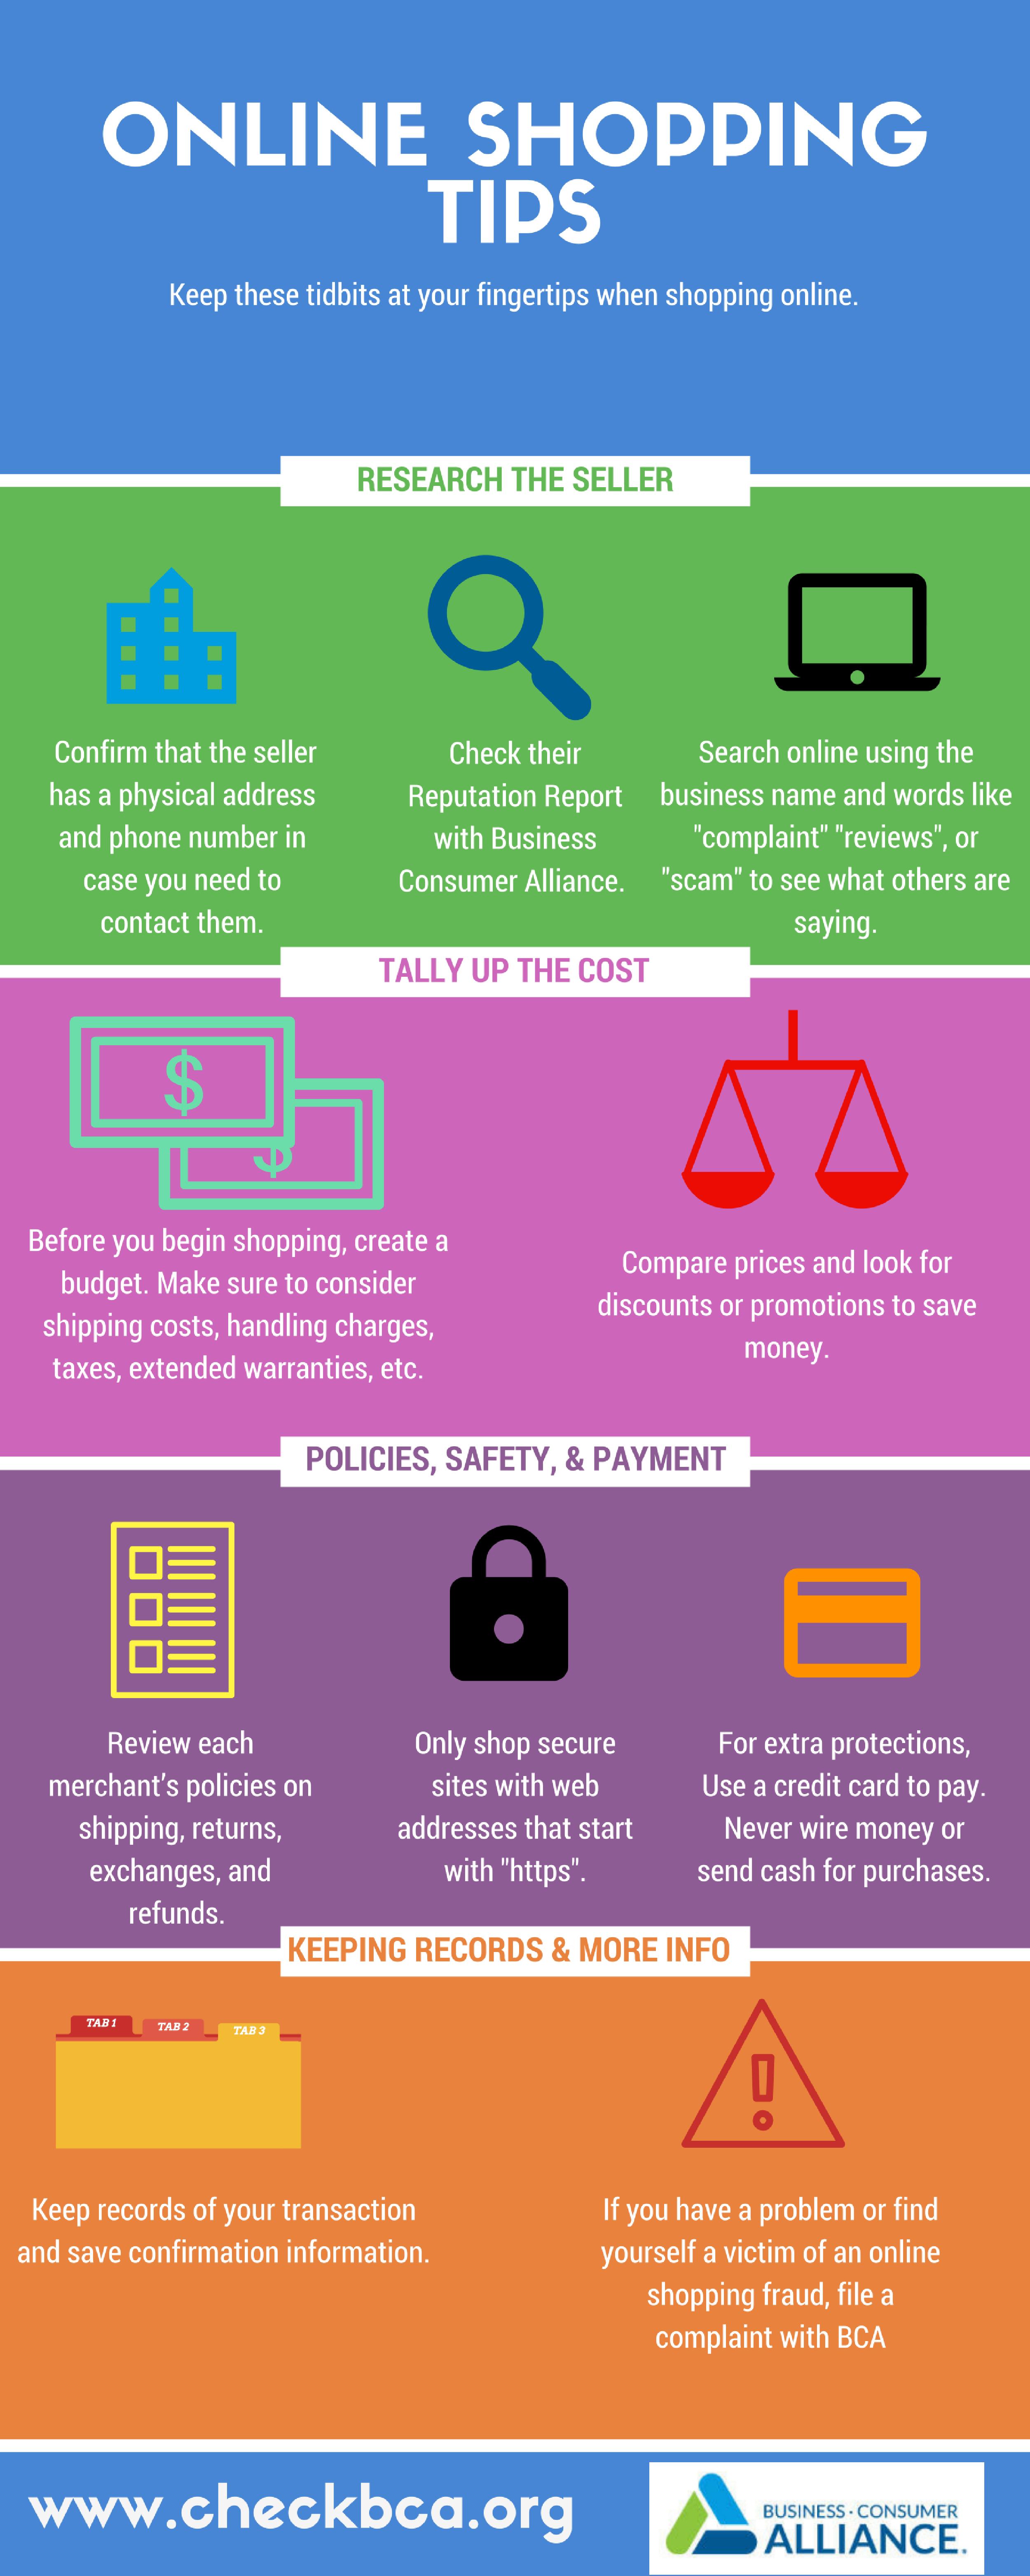 Business Consumer Alliance: Online Shopping Tips